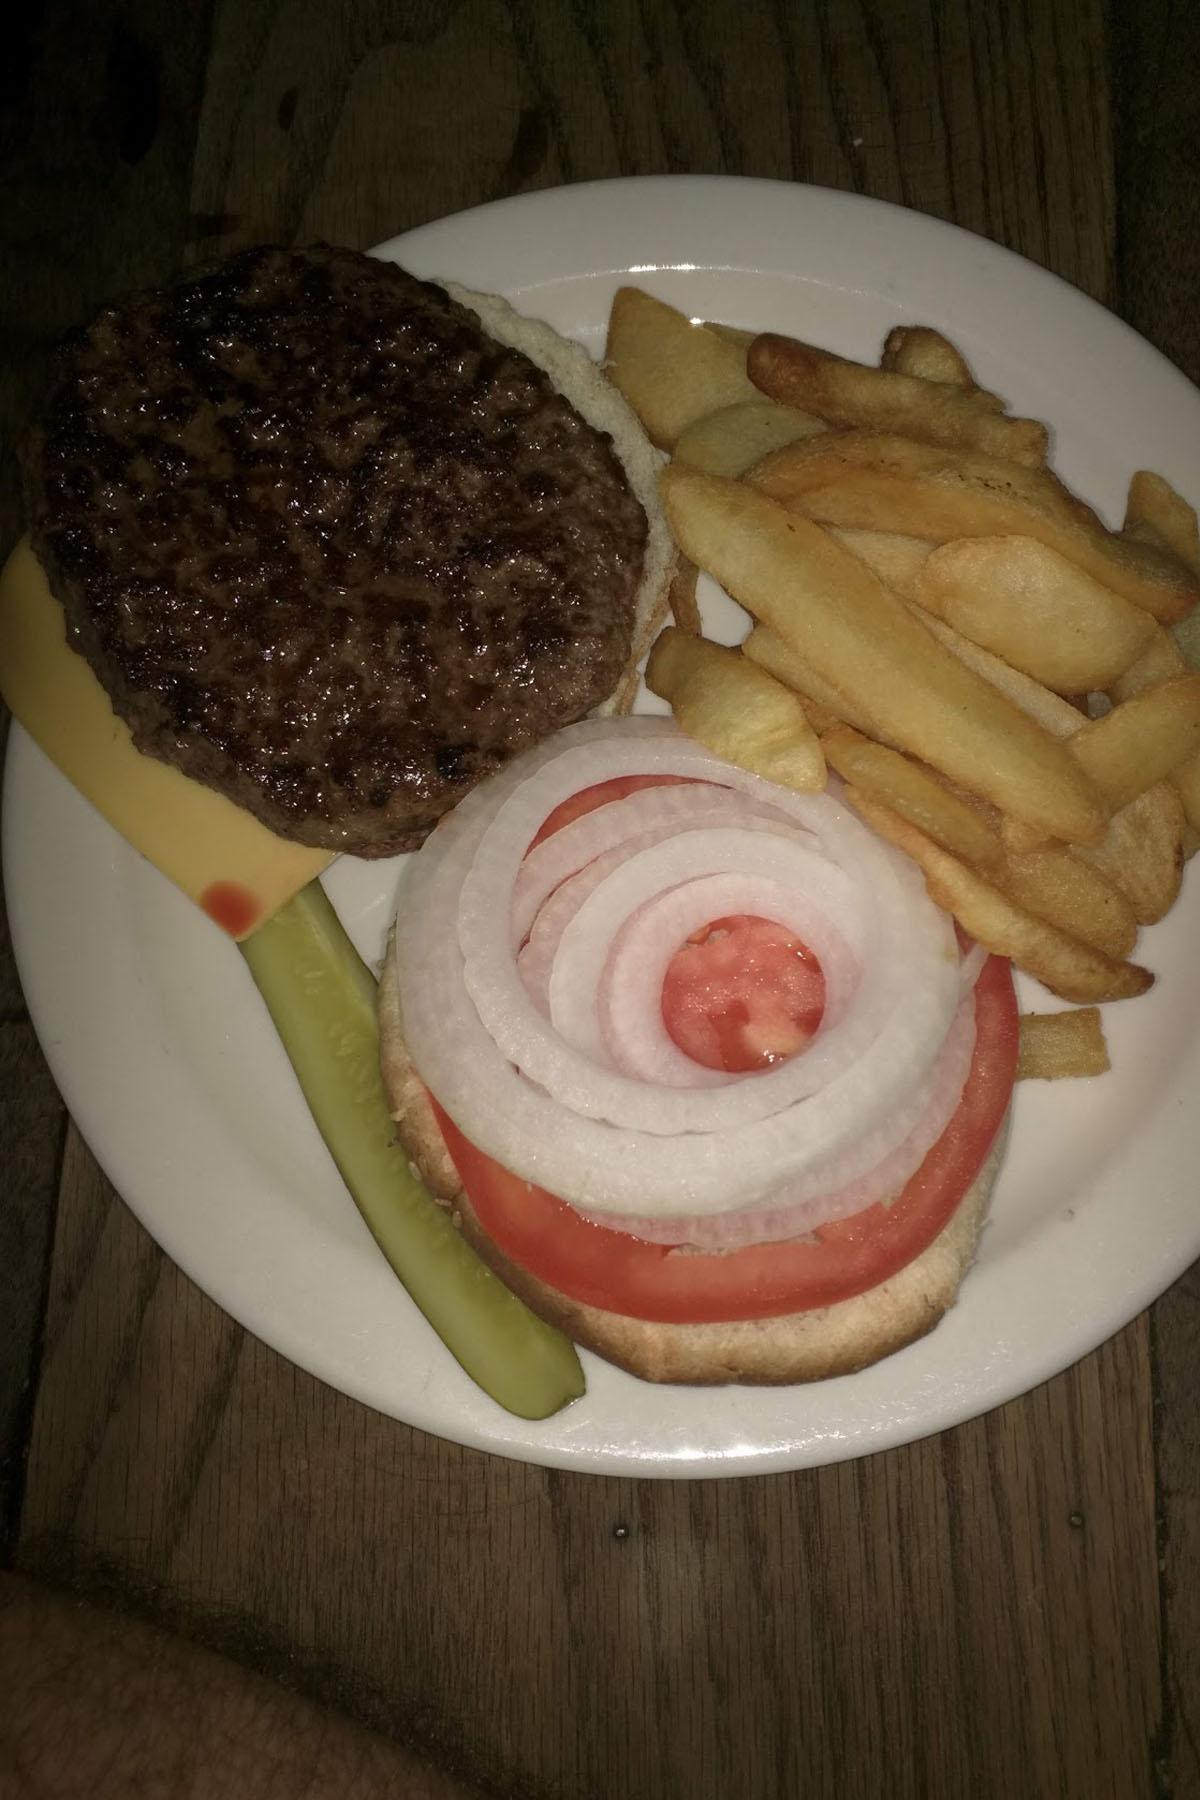 Burger photo resized.jpg